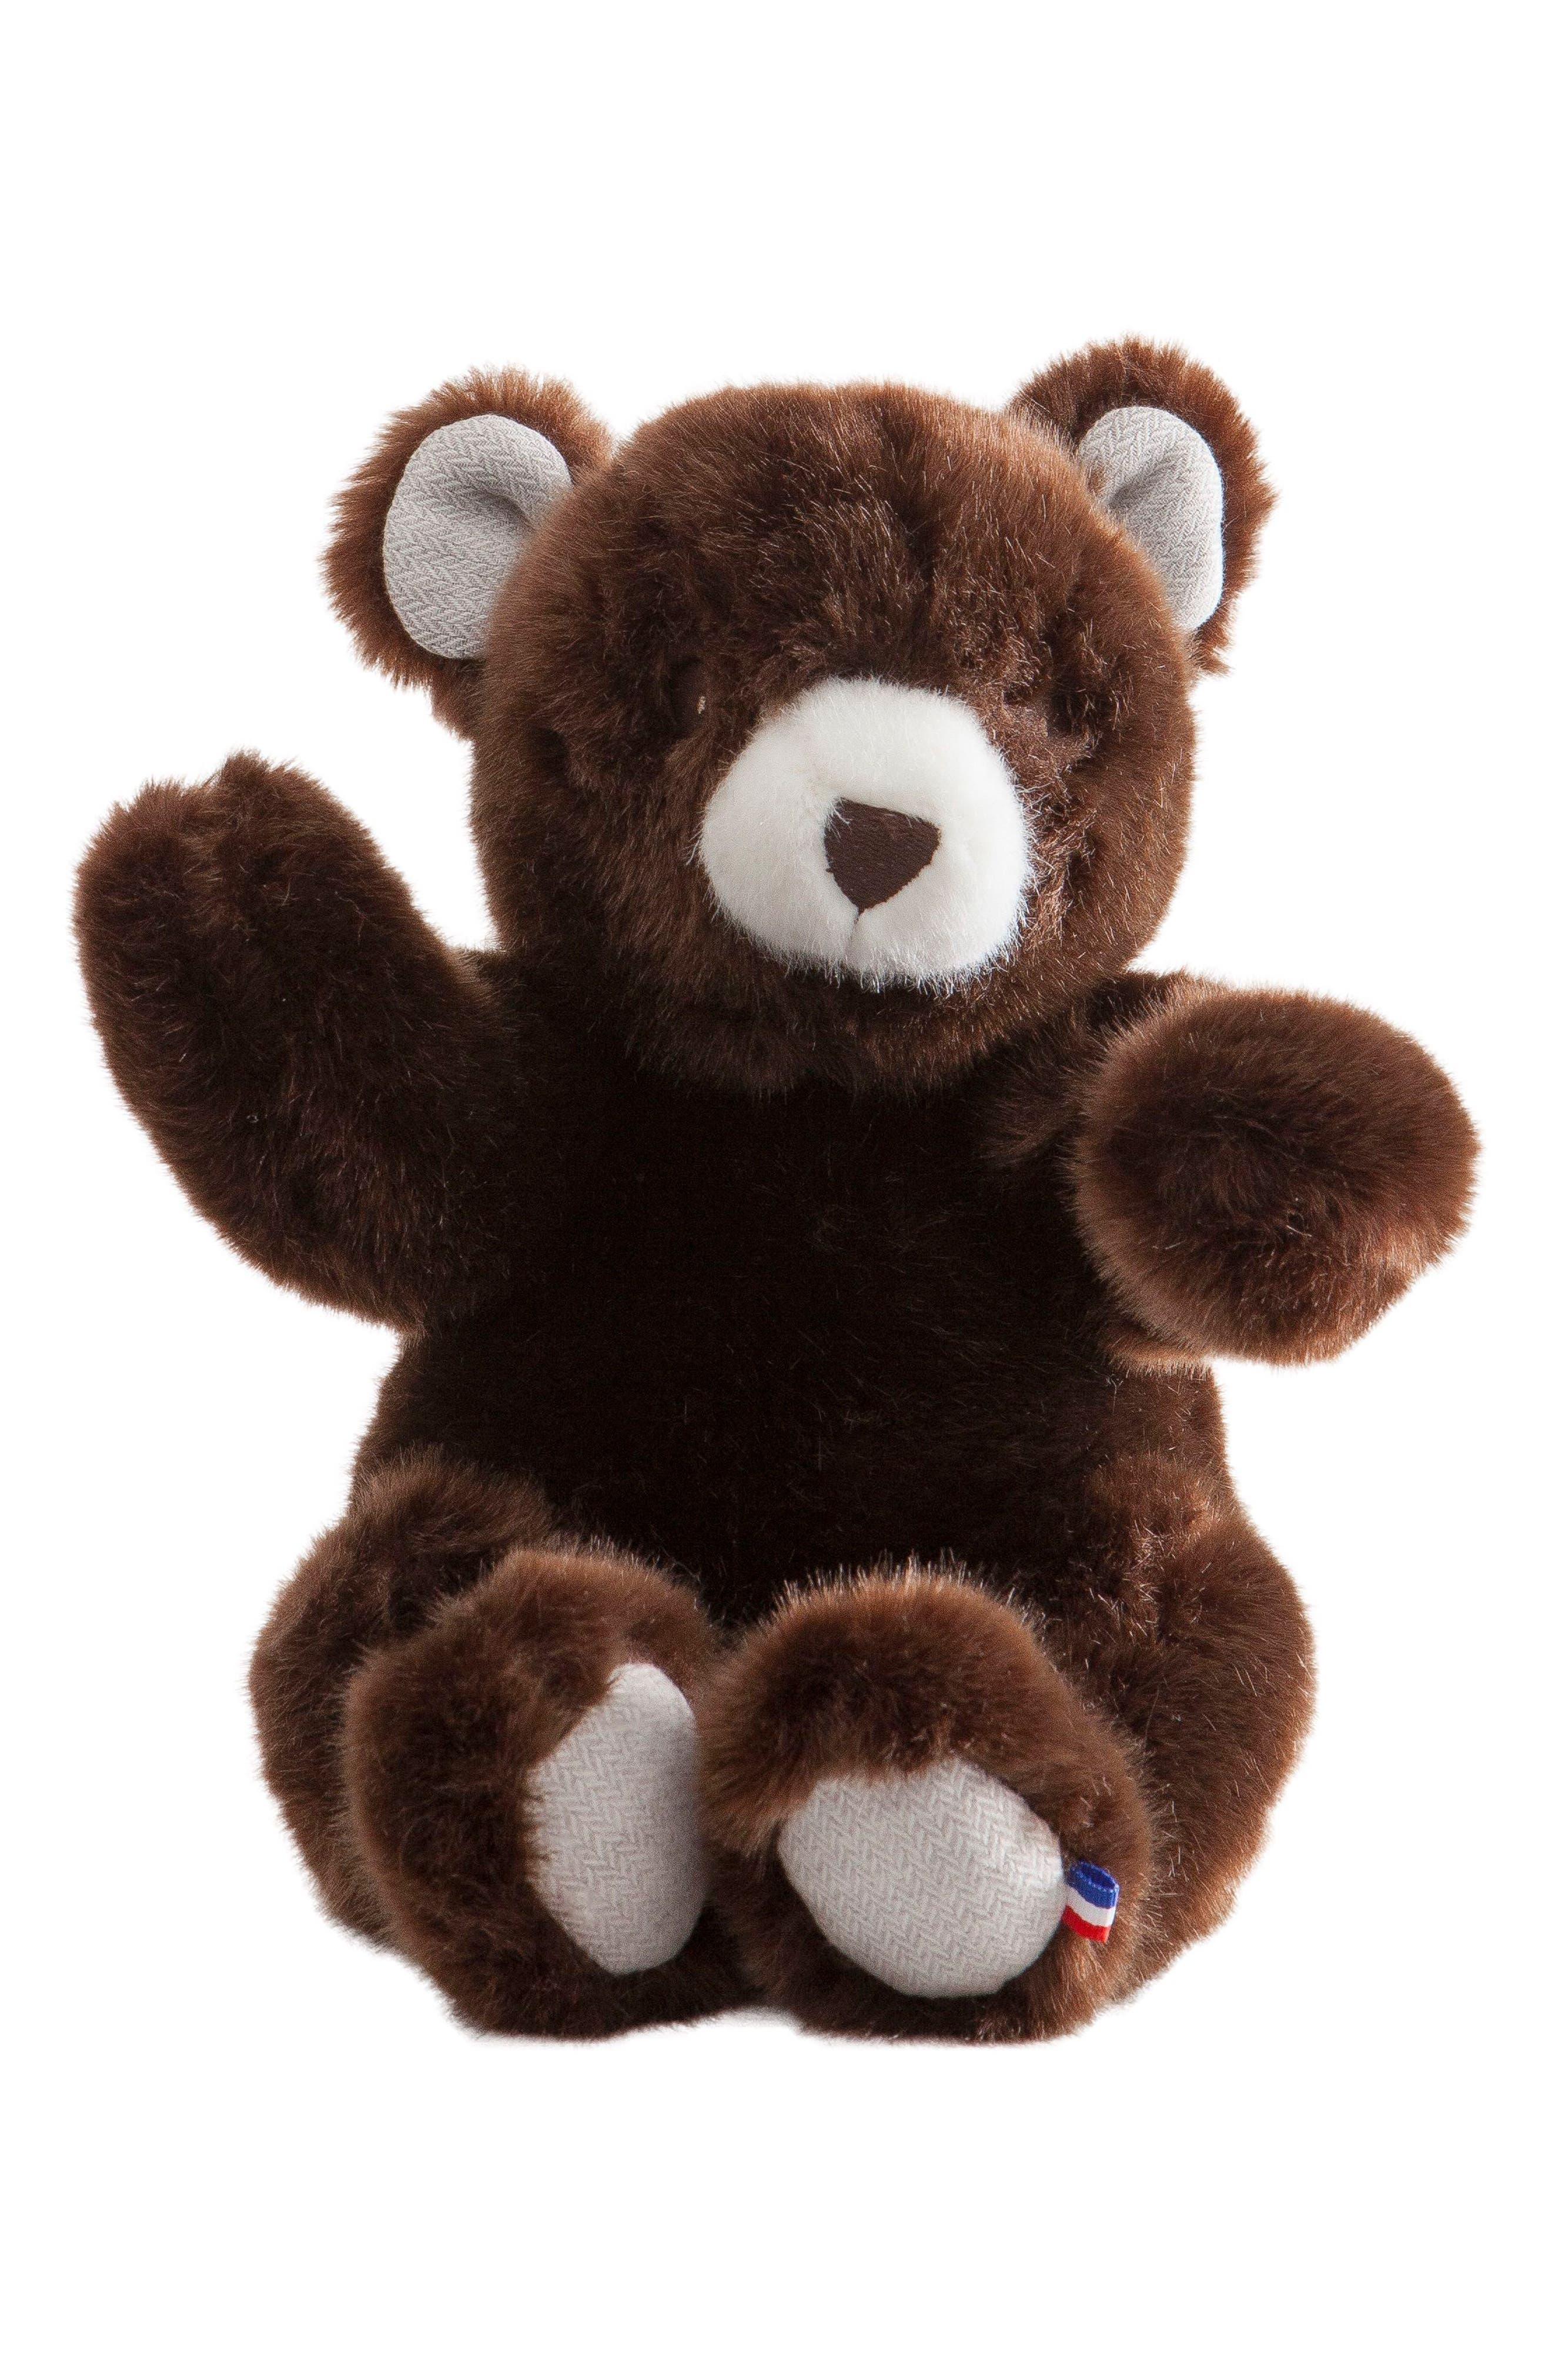 Robert the Bear Stuffed Animal,                             Main thumbnail 1, color,                             BROWN